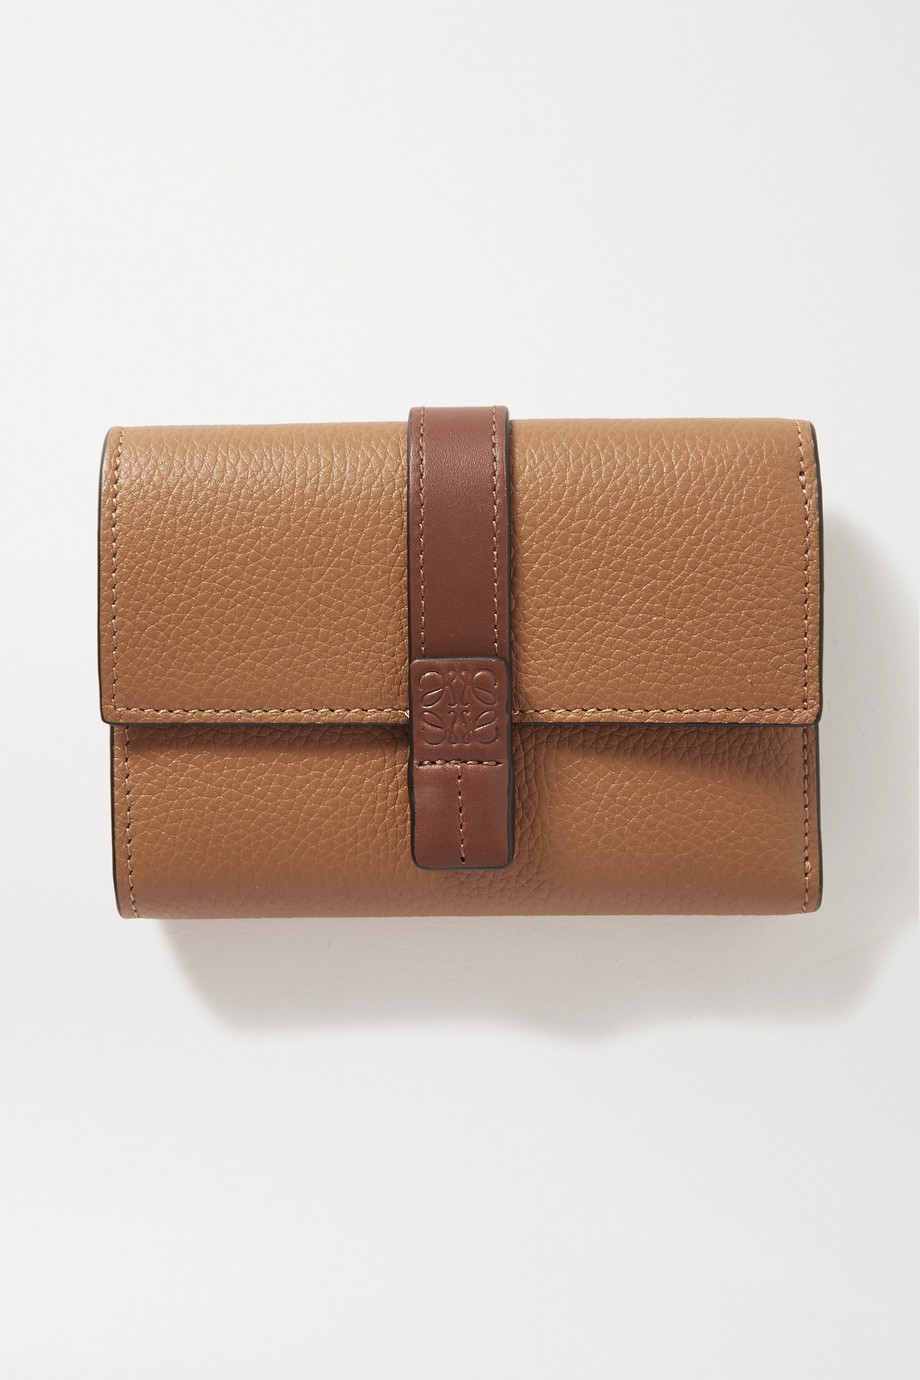 Loewe Portefeuille en cuir texturé